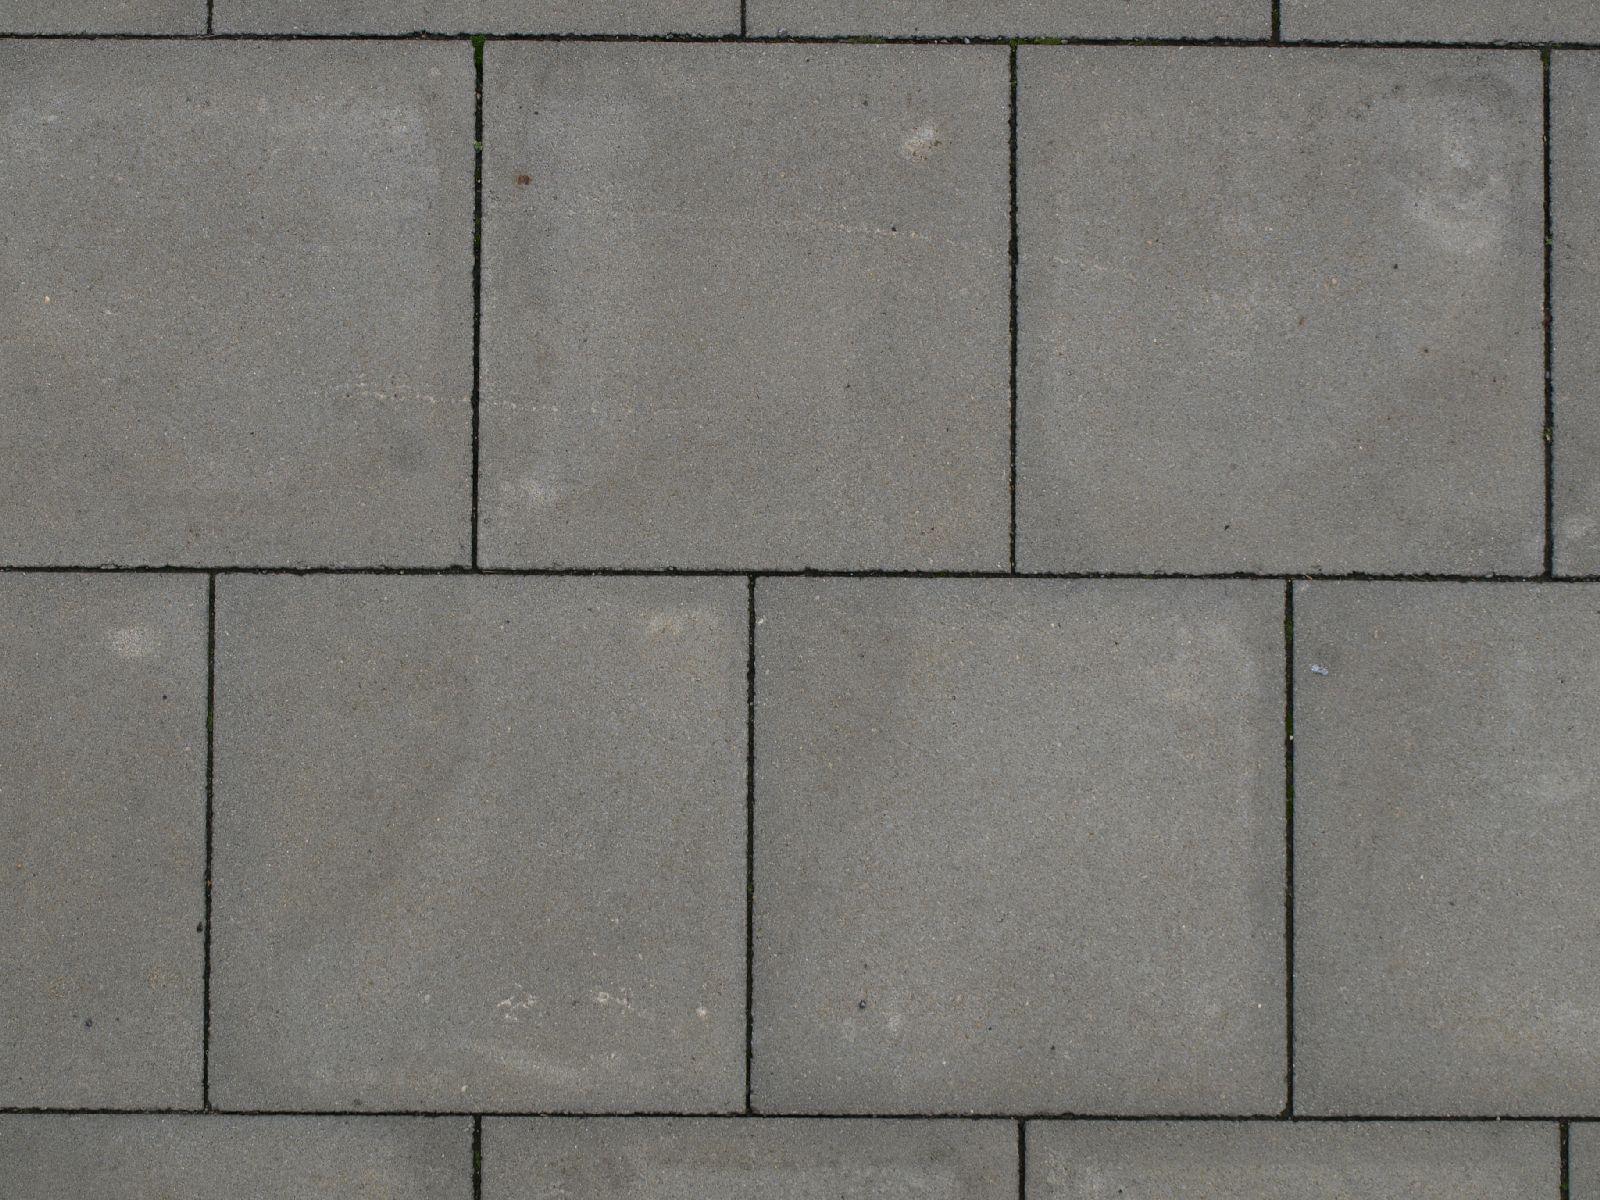 Ground-Urban_Texture_A_PA045735